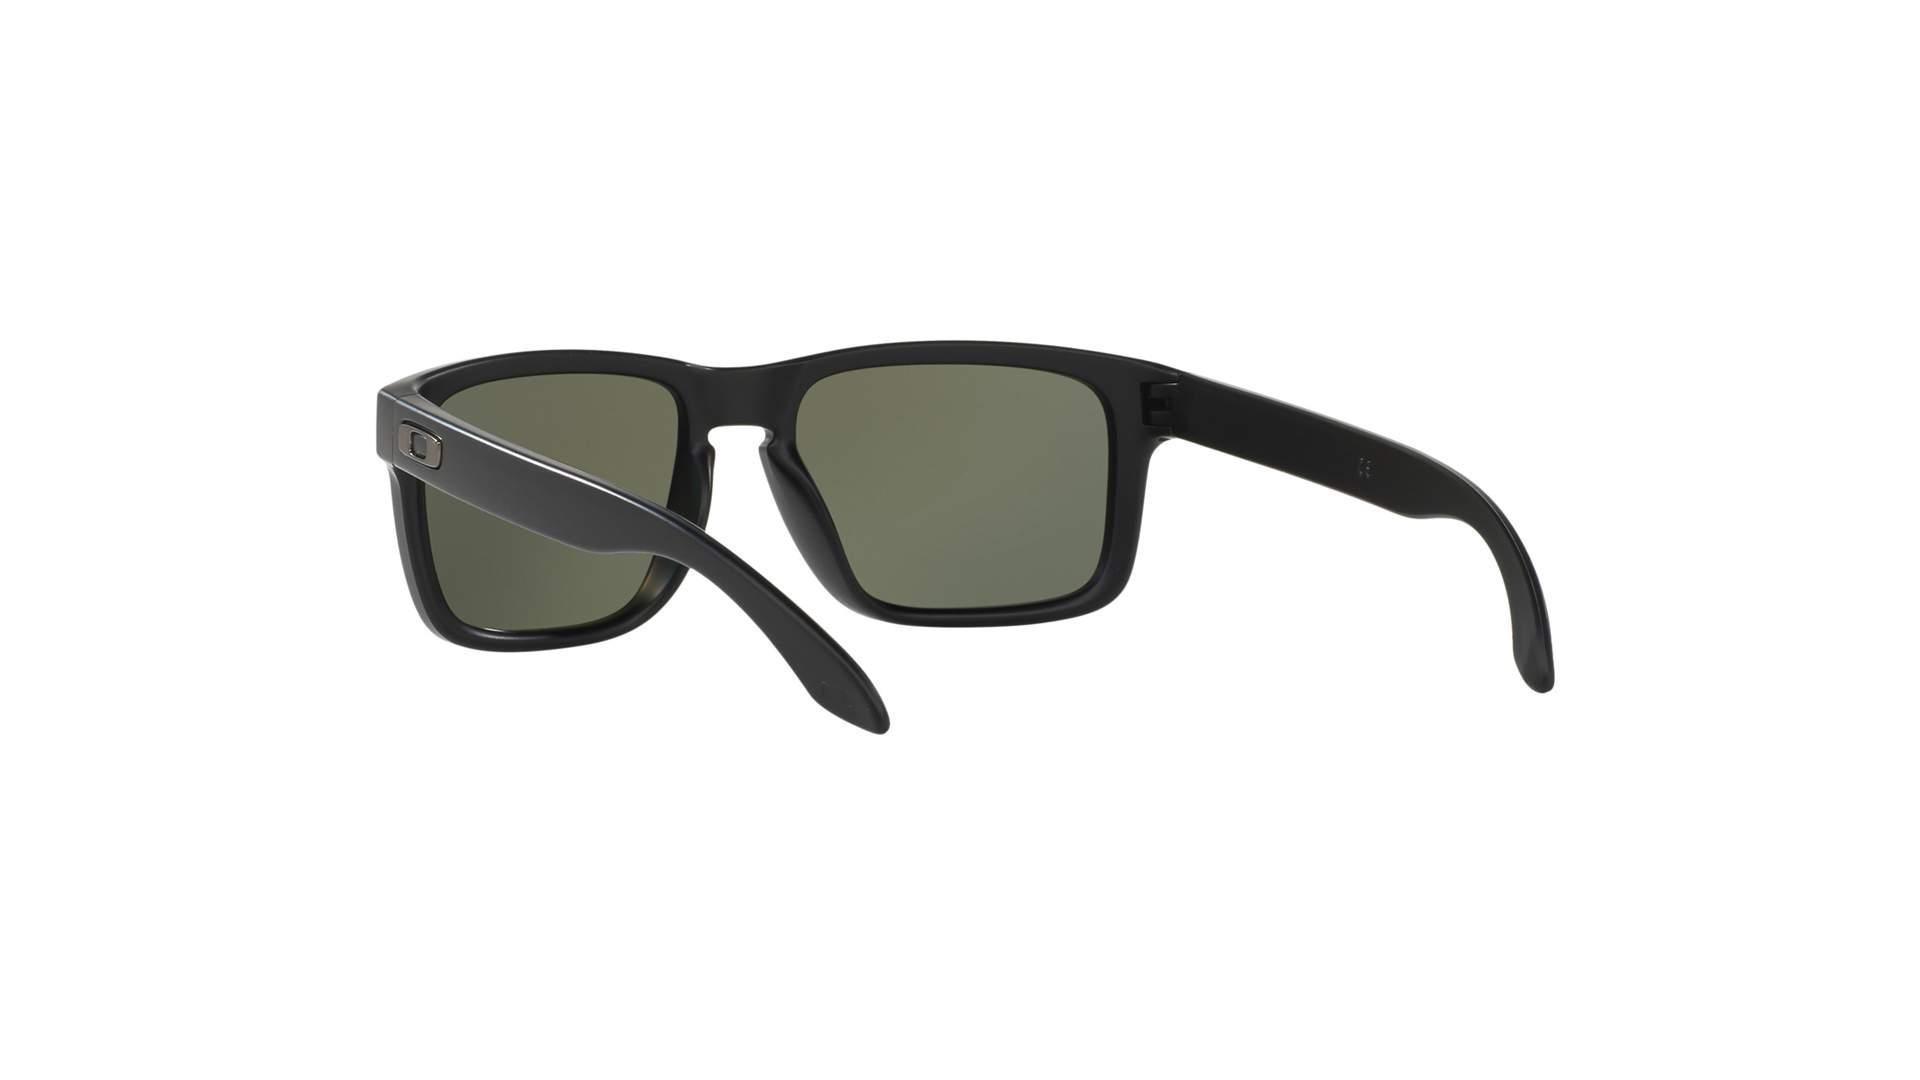 61010d88b1 Sunglasses Oakley Holbrook Black Matte OO9102 D6 55-18 Large Polarized